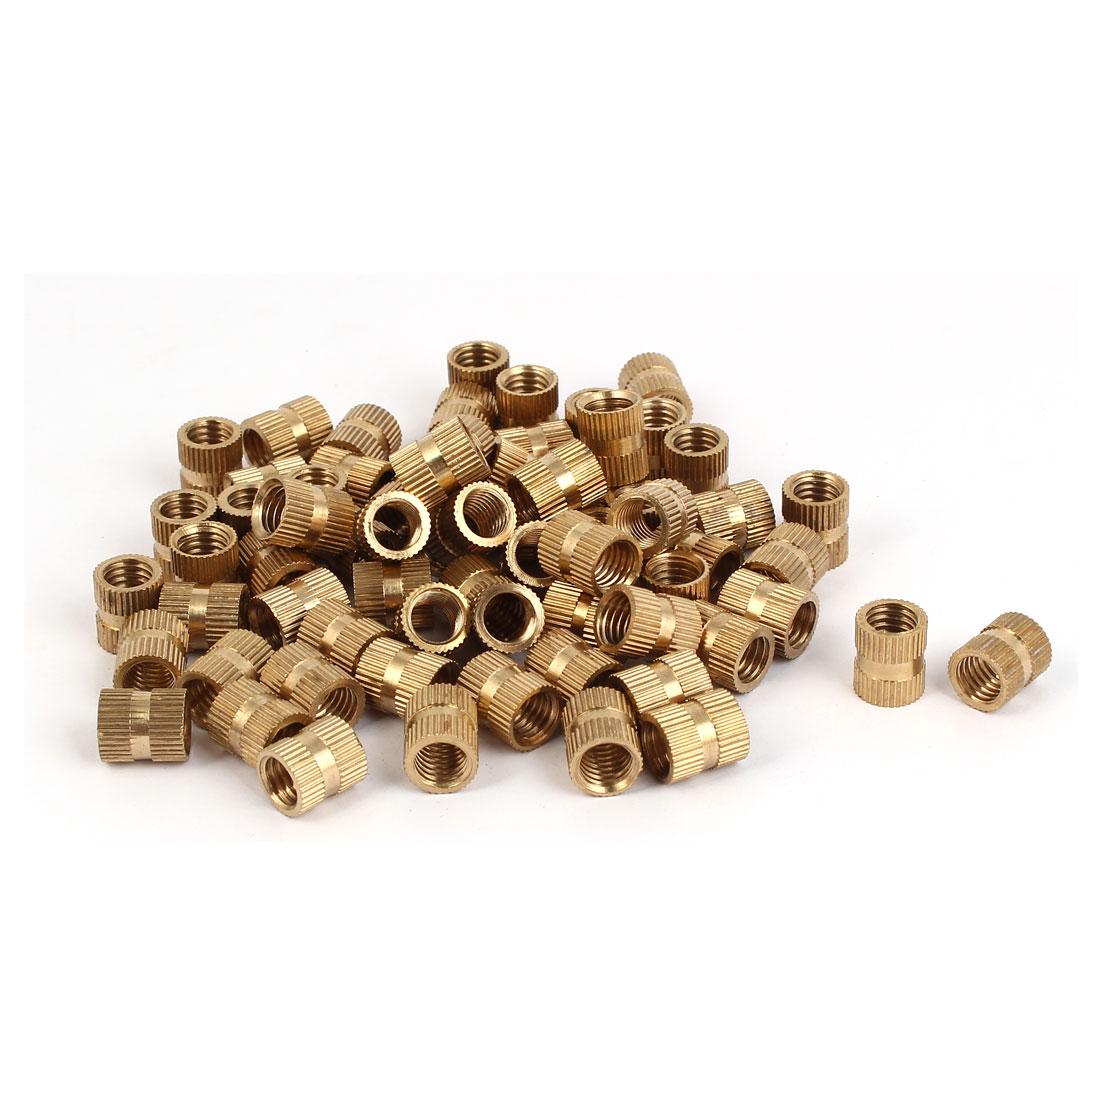 M8 x 12mm x 10mm Cylinder Brass Knurled Threaded Insert Embedment Nuts 100PCS